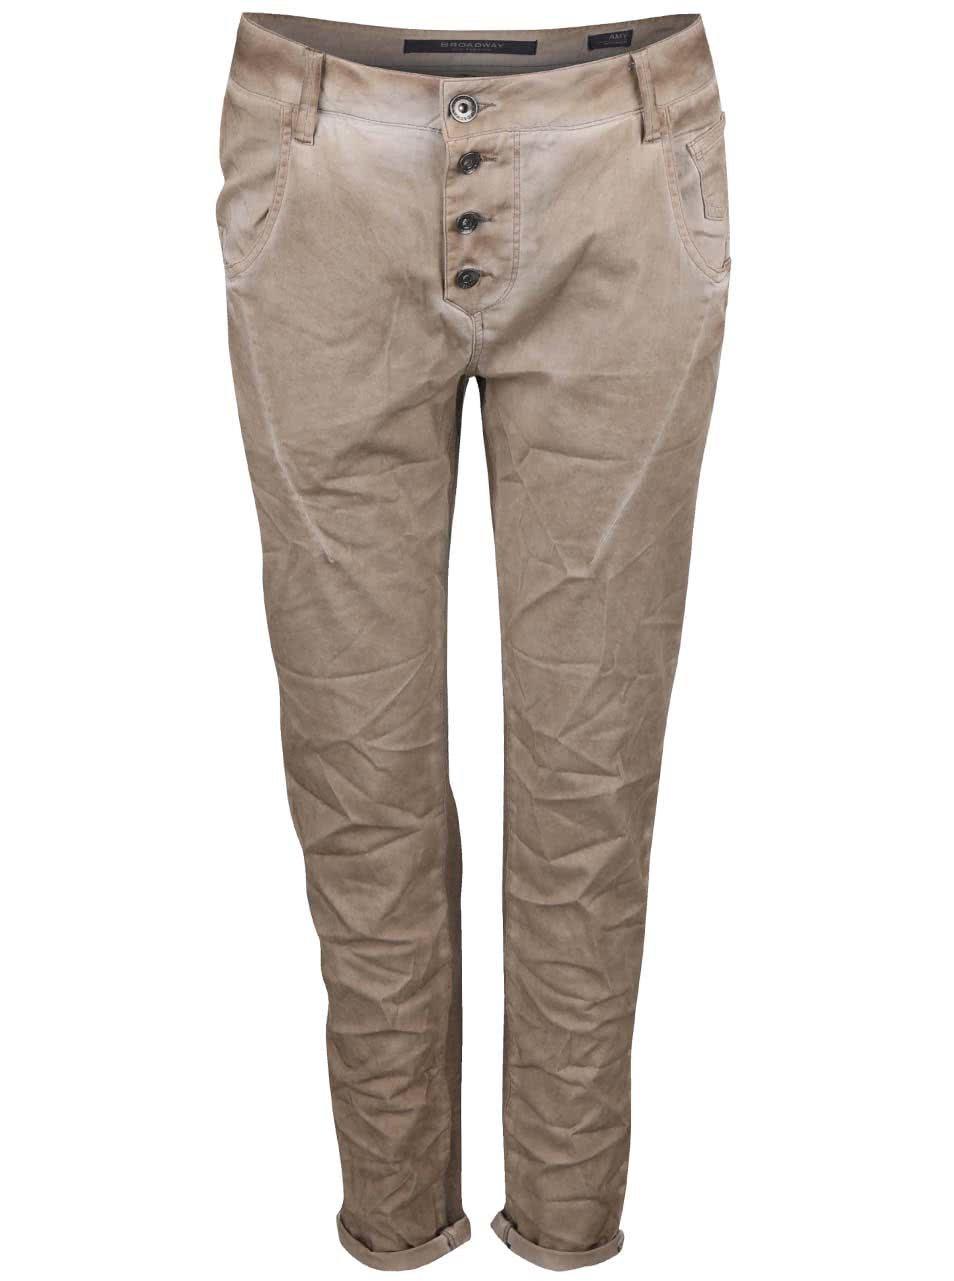 a5c7a683e044 Béžové dámske nohavice s elastickým zadným dielom Broadway Amy ...